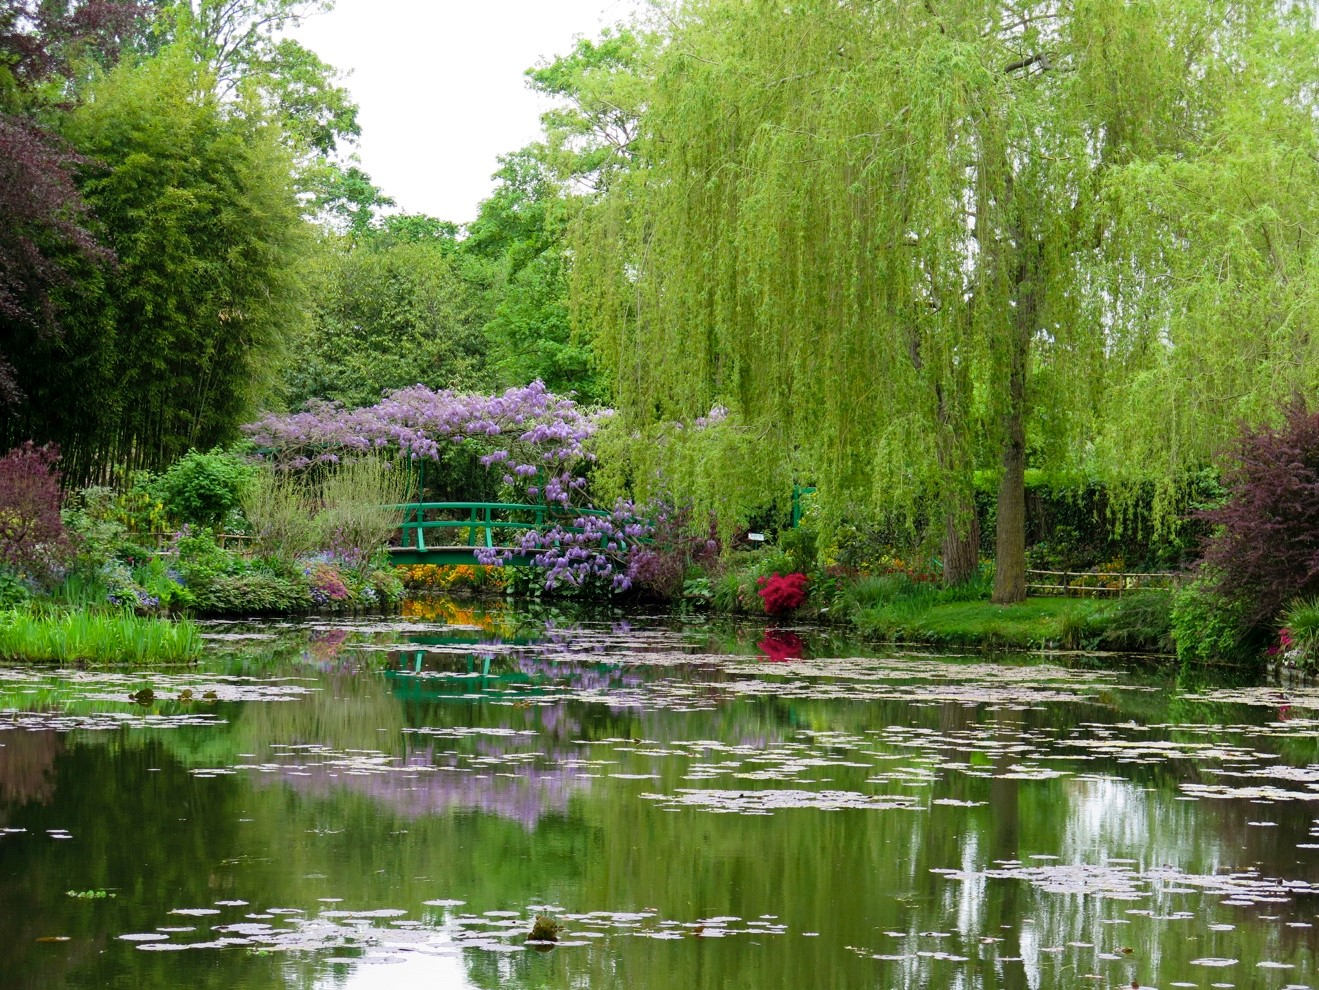 Visiting Monet's Garden